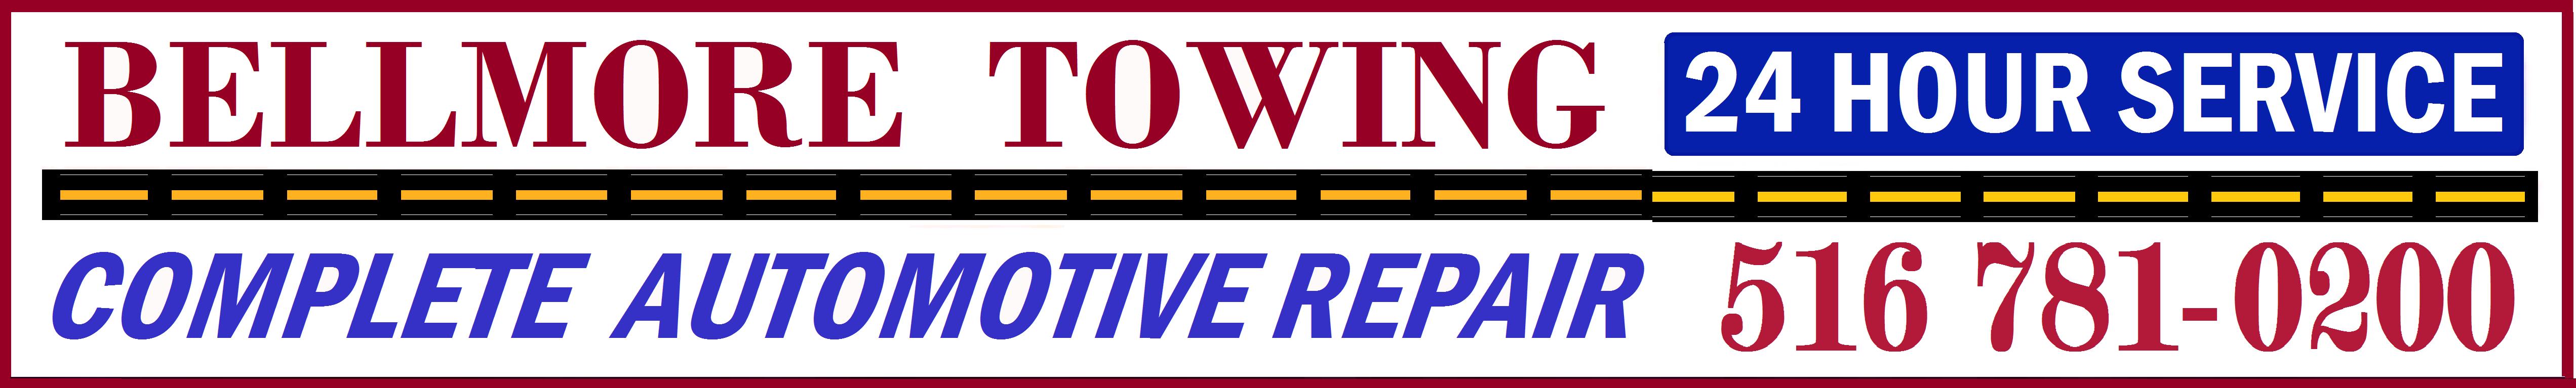 BELLMORE TOW COMPLETE AUTOMOTVIVE REPAIR